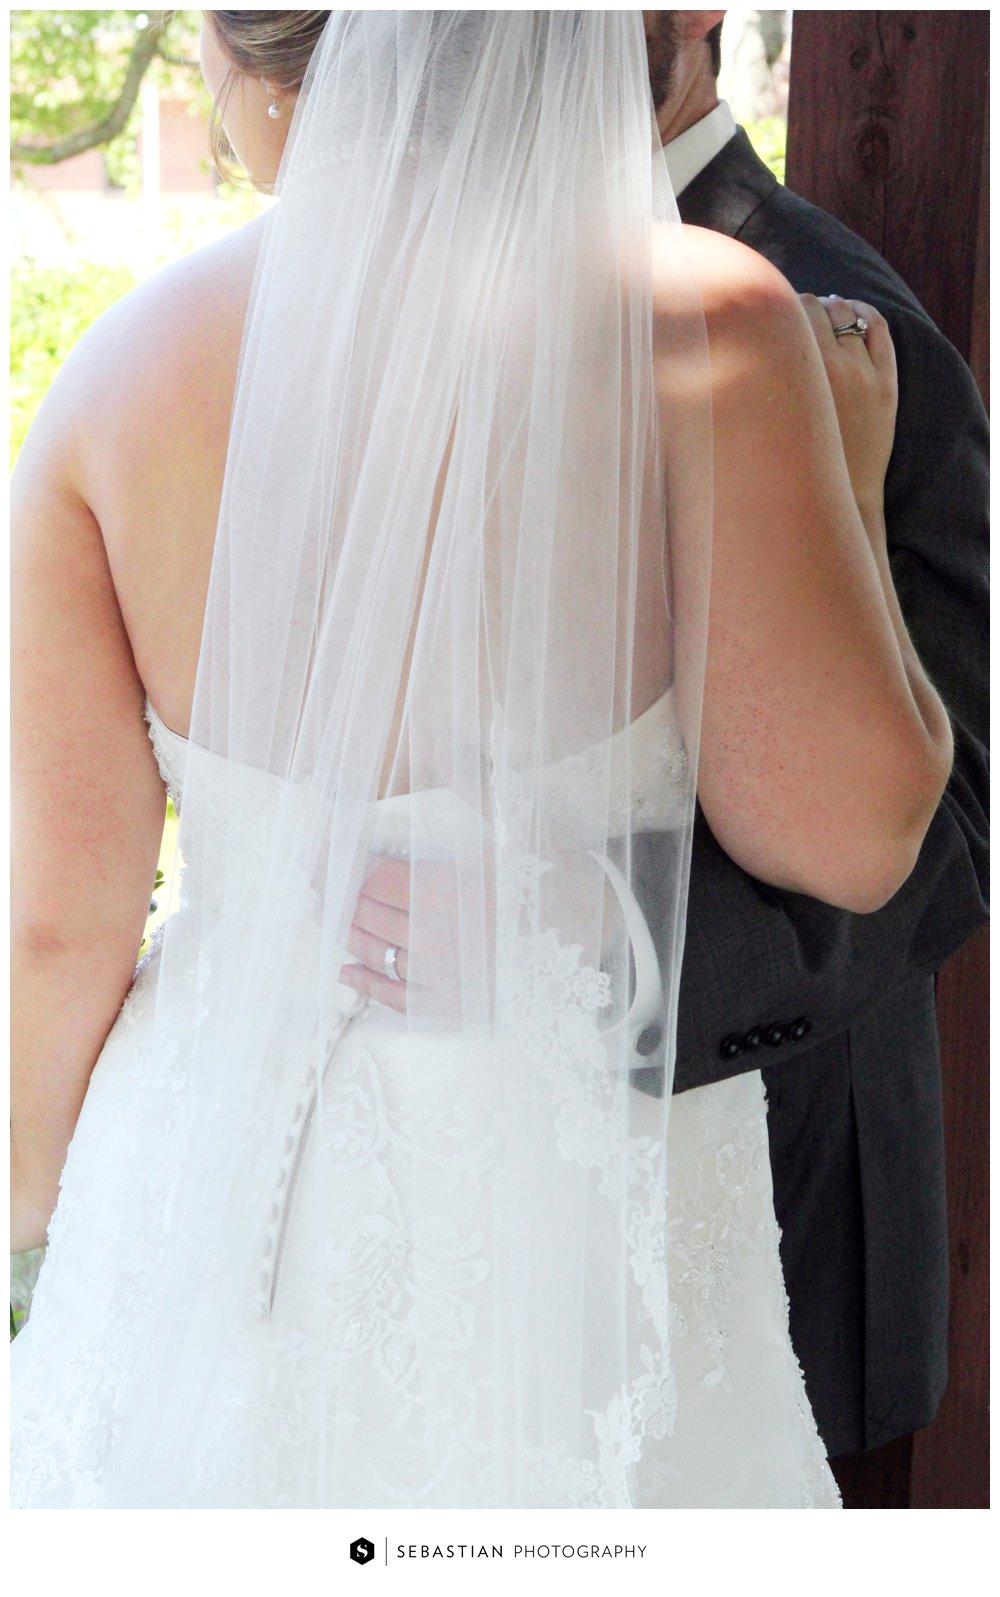 Sebastian Photography_CT Wedding Photographer_Lake of Isles_6041.jpg